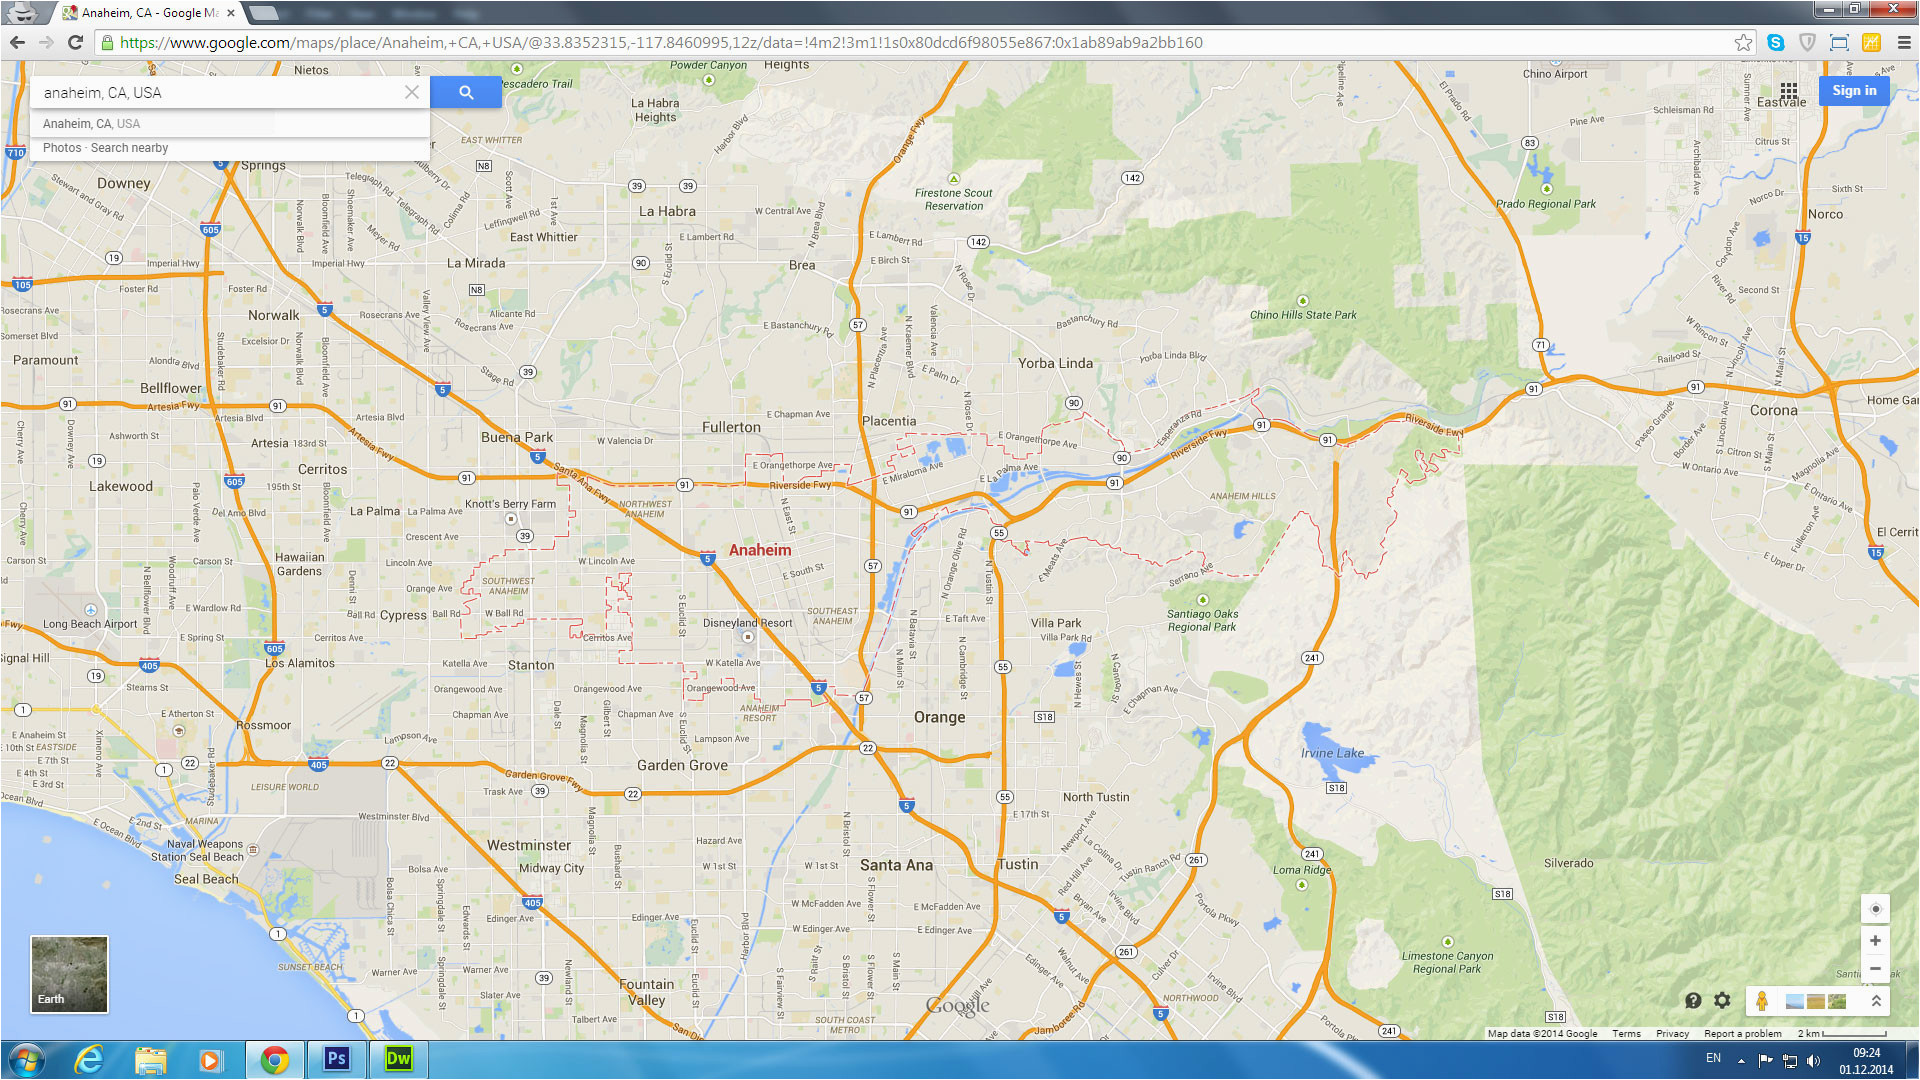 Disneyland California Google Maps Google Maps Disneyland California on